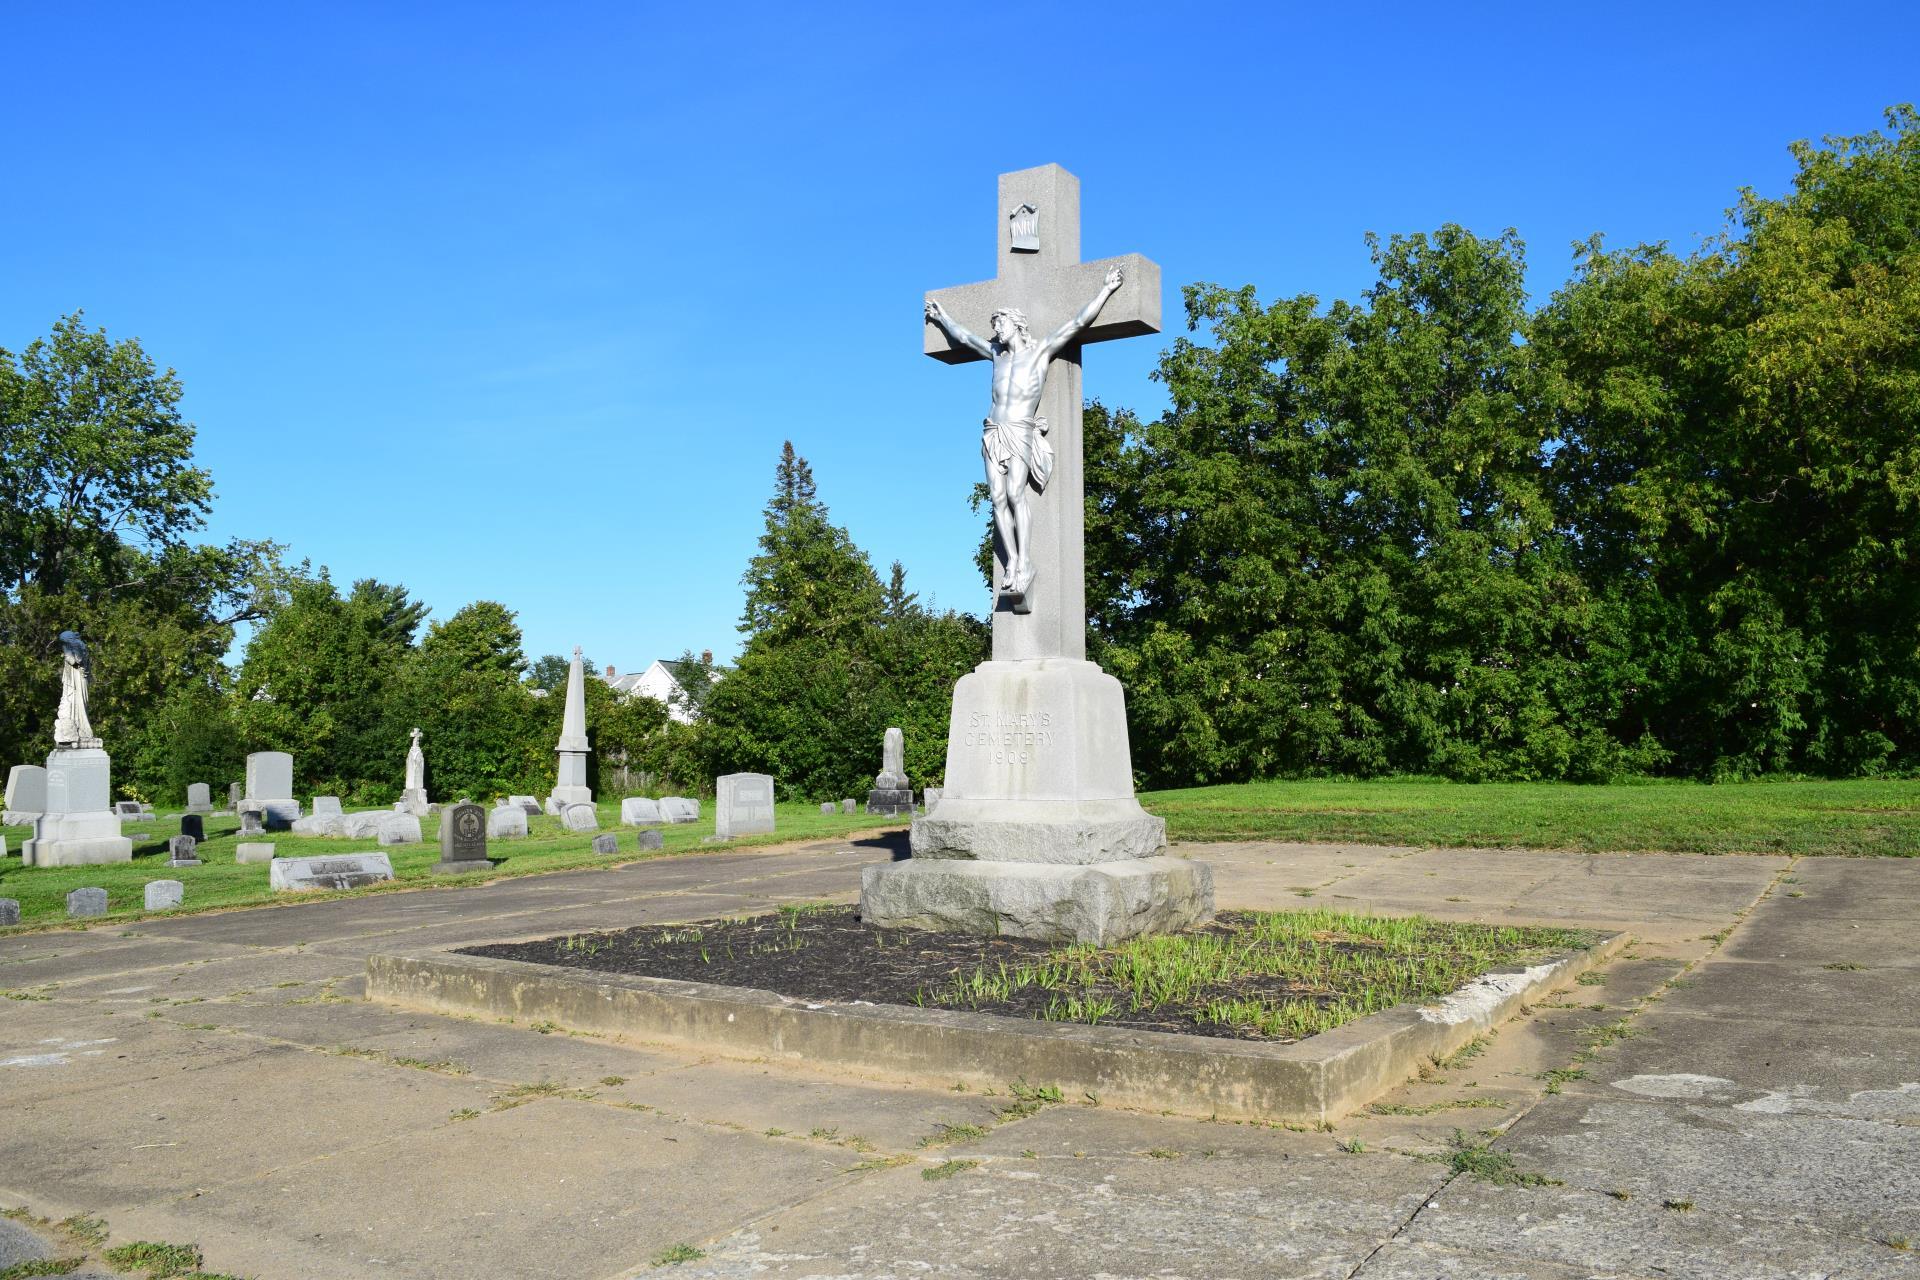 Large crucifix monument